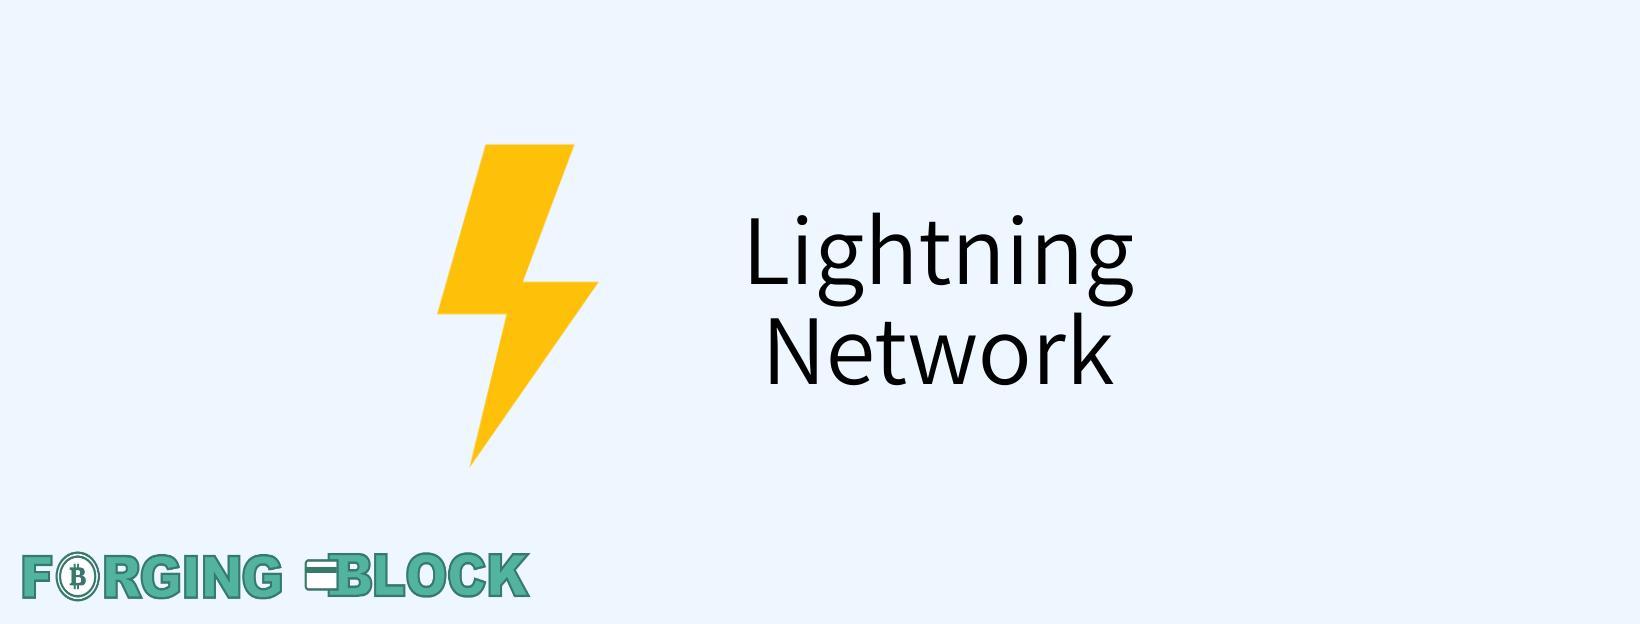 ForgingBlock Lighting Network Gateway